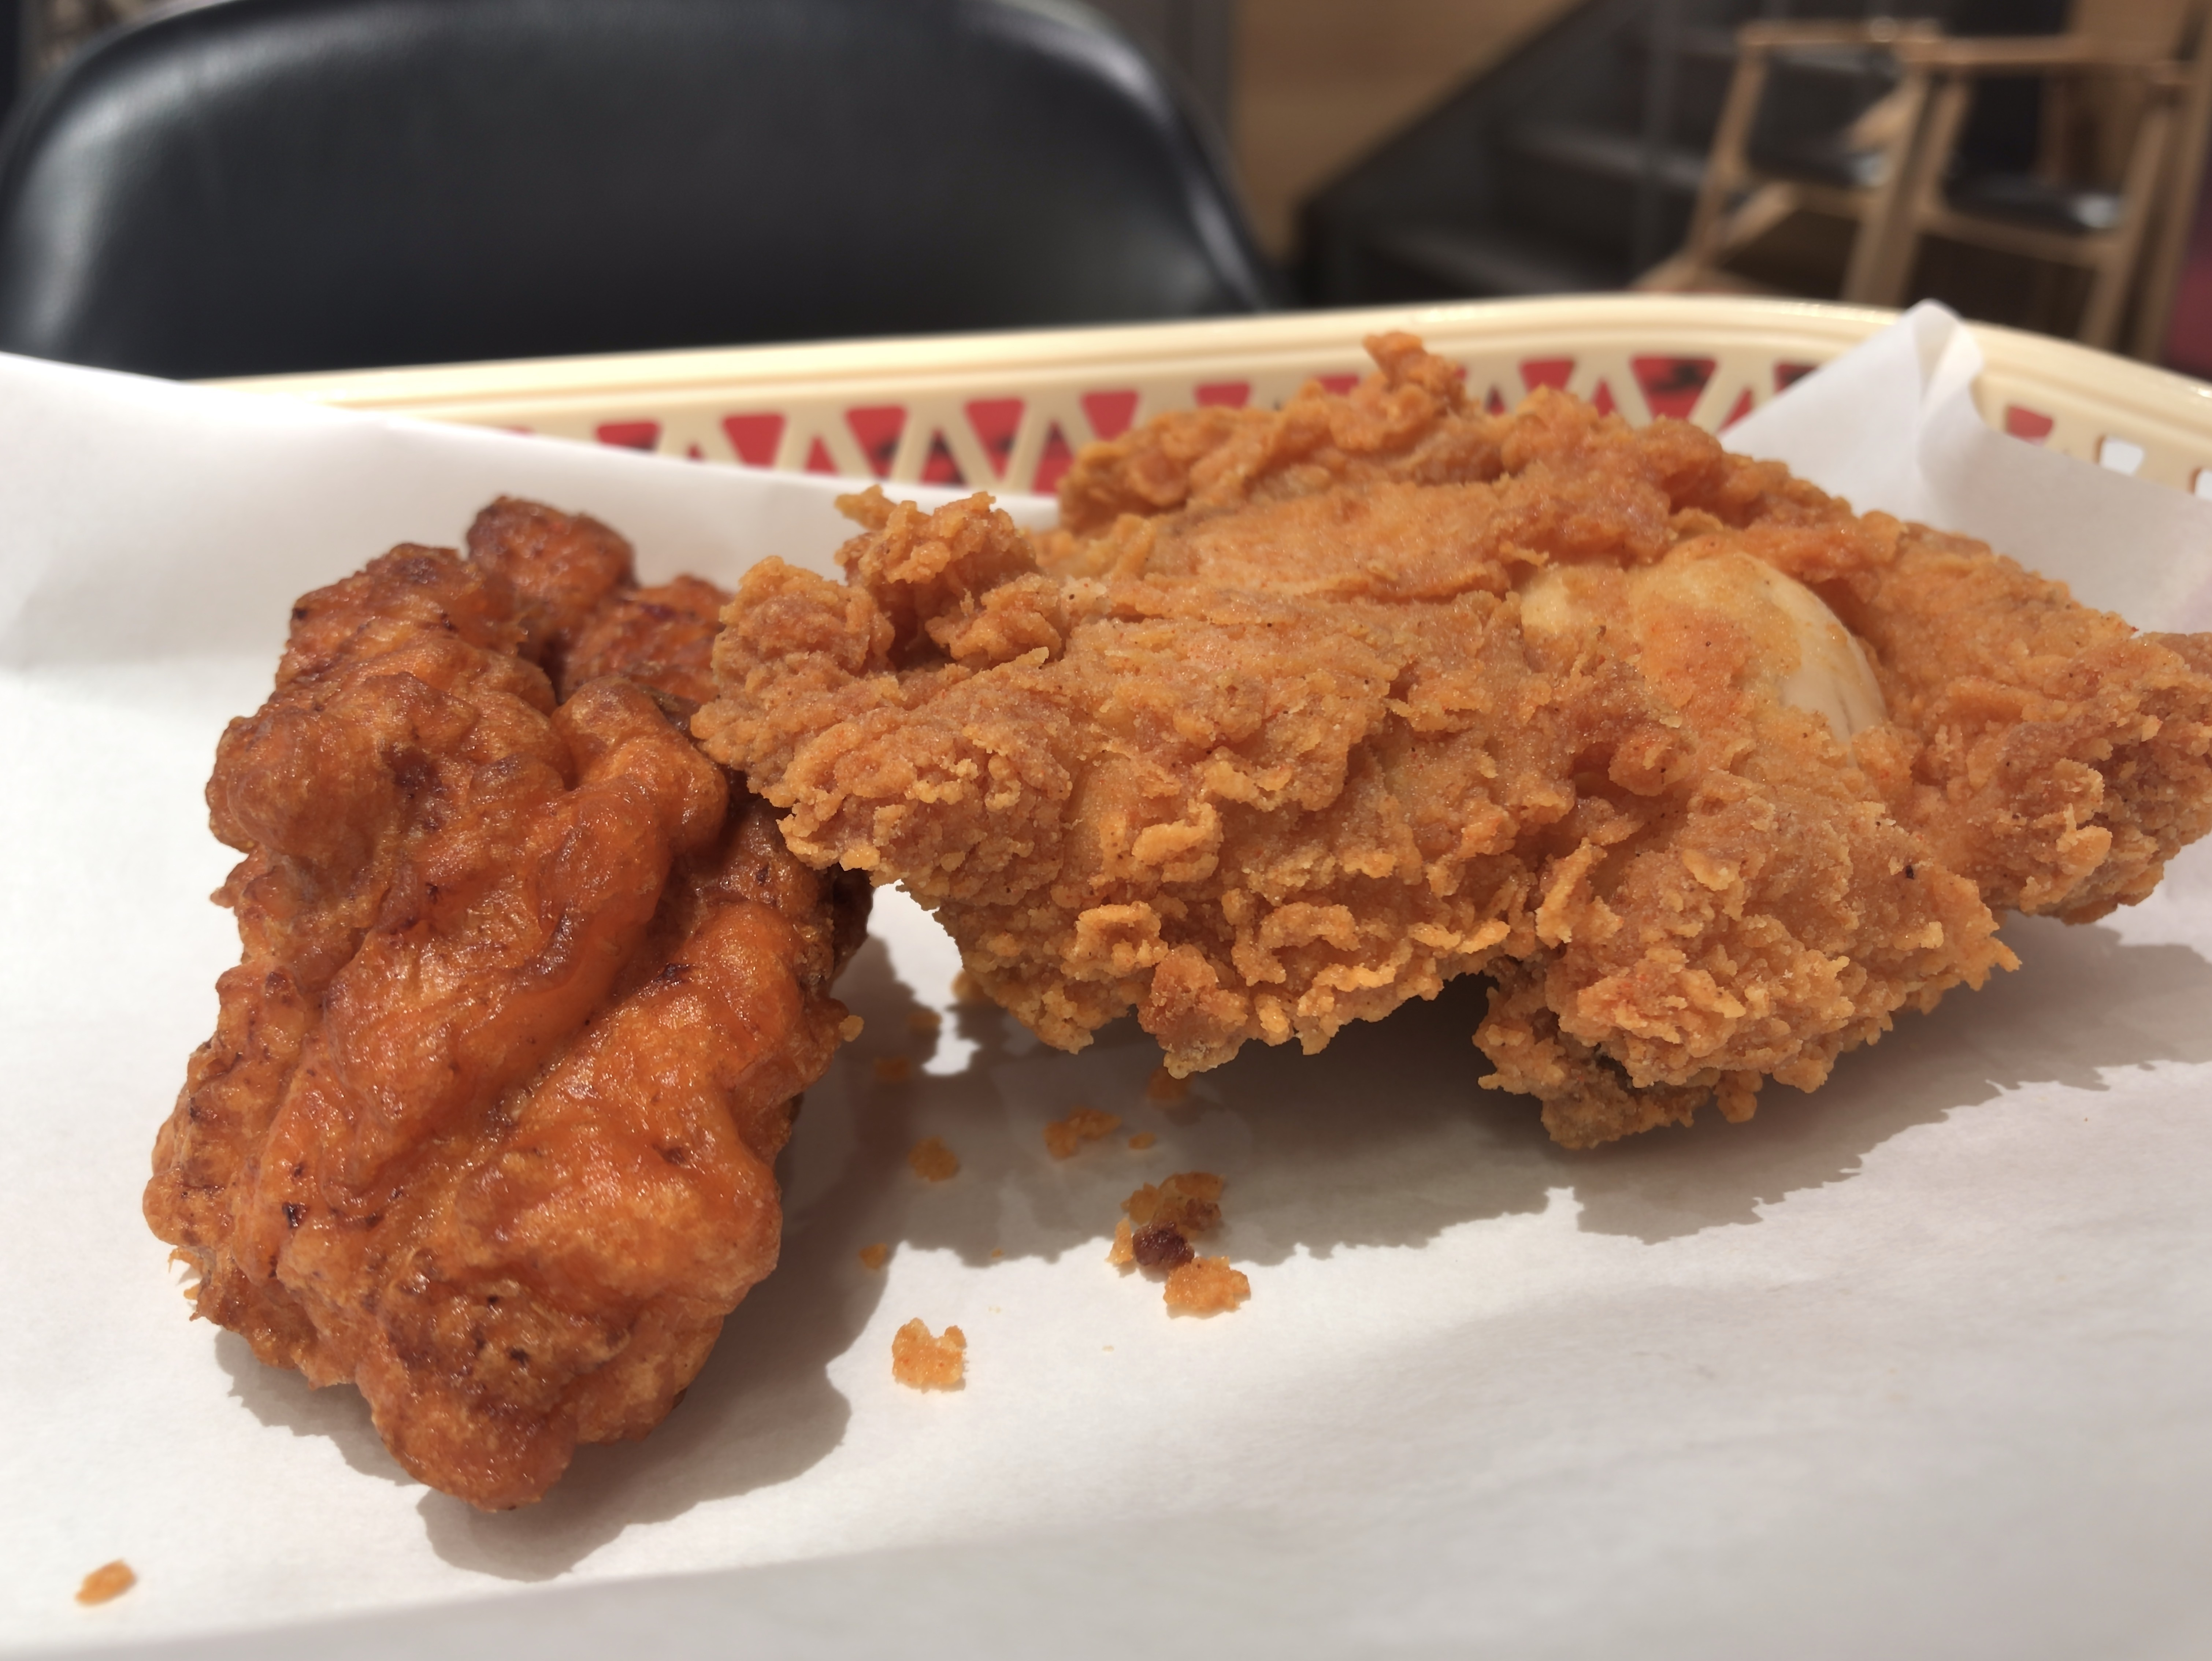 [KFC][レッドホット][クリスピー][220円][172kcal][レッドホットチキン][270円][266kcal][(税込)]